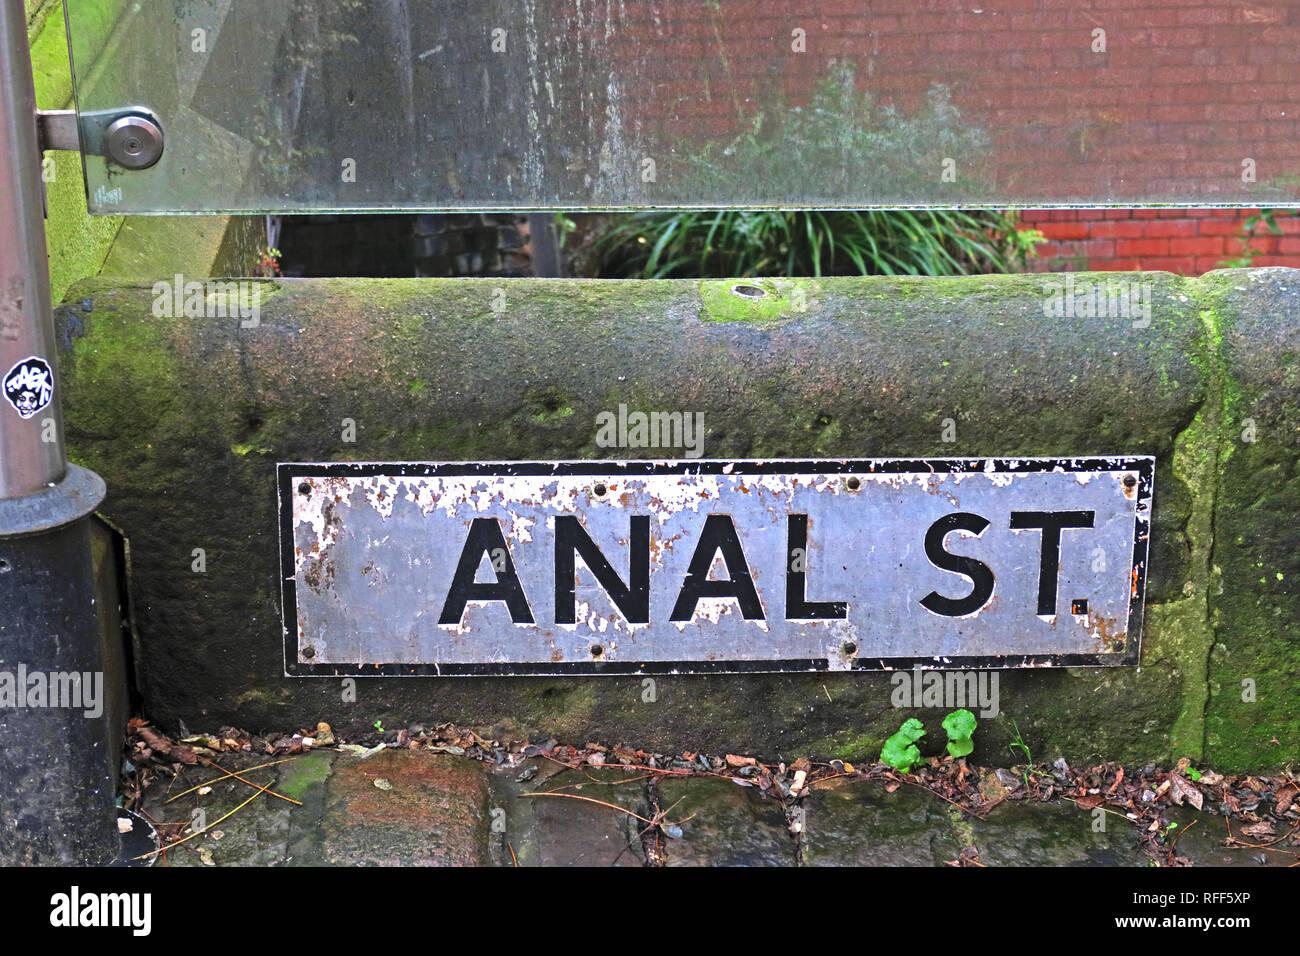 Manchester,City centre,city,@HotpixUK,HotpixUK,GoTonySmith,North West England,UK,England,Canal St,gay,village,Sackville,LGBT,LGBTI,community,Anal Street,anal,Anal treet,treat,sign,anal street,the centre of the Gay Village,LGBT Community,LBGTQ Community,defaced sign,defaced,street sign,famous,gay tourism,gay tourists,tourism,tourists,Rochdale canal,lesbian,gay clubs